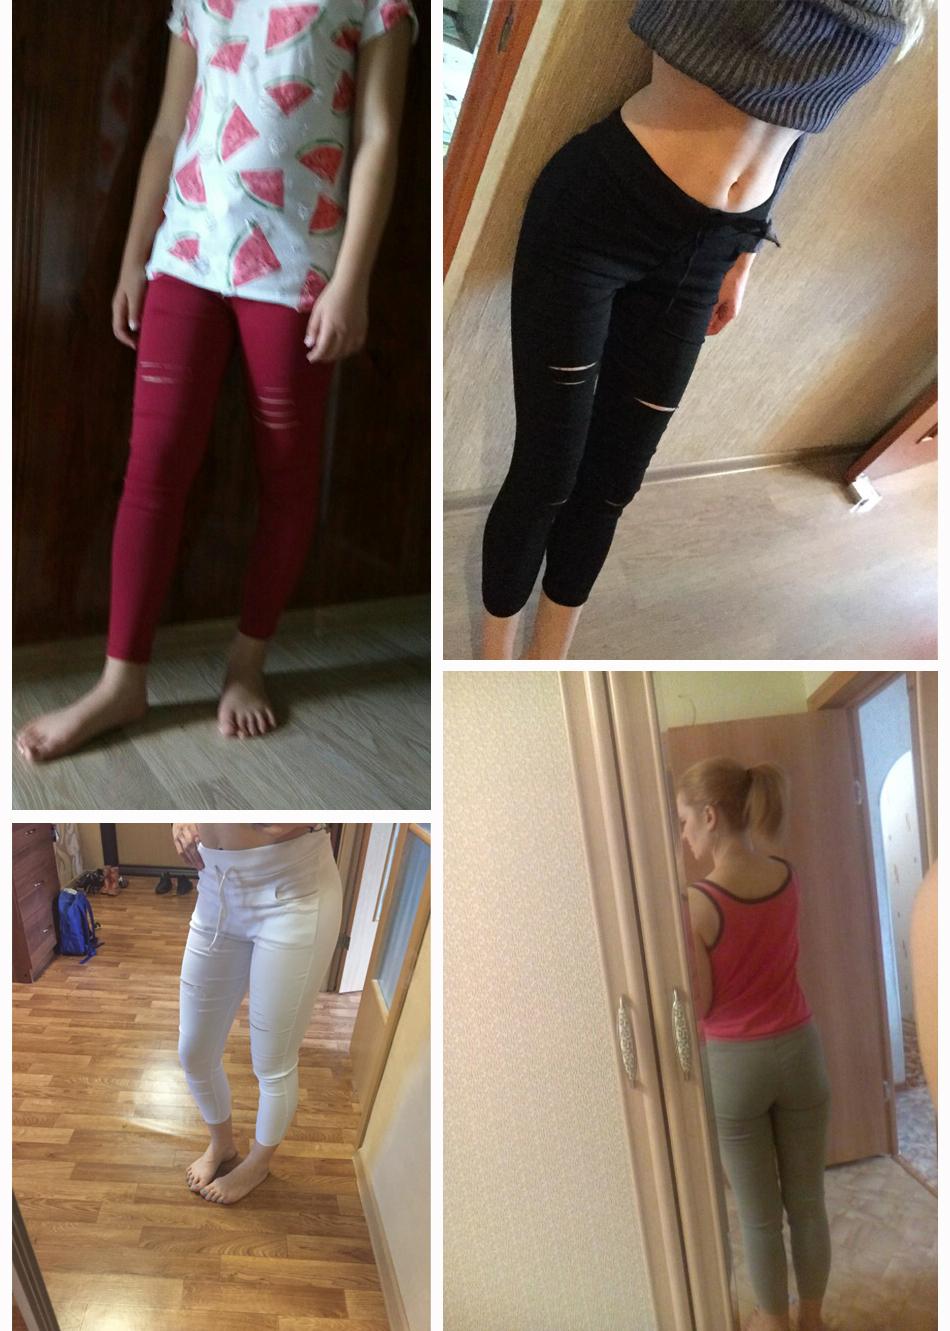 Women's Hollow Solid Cotton Leggings 15